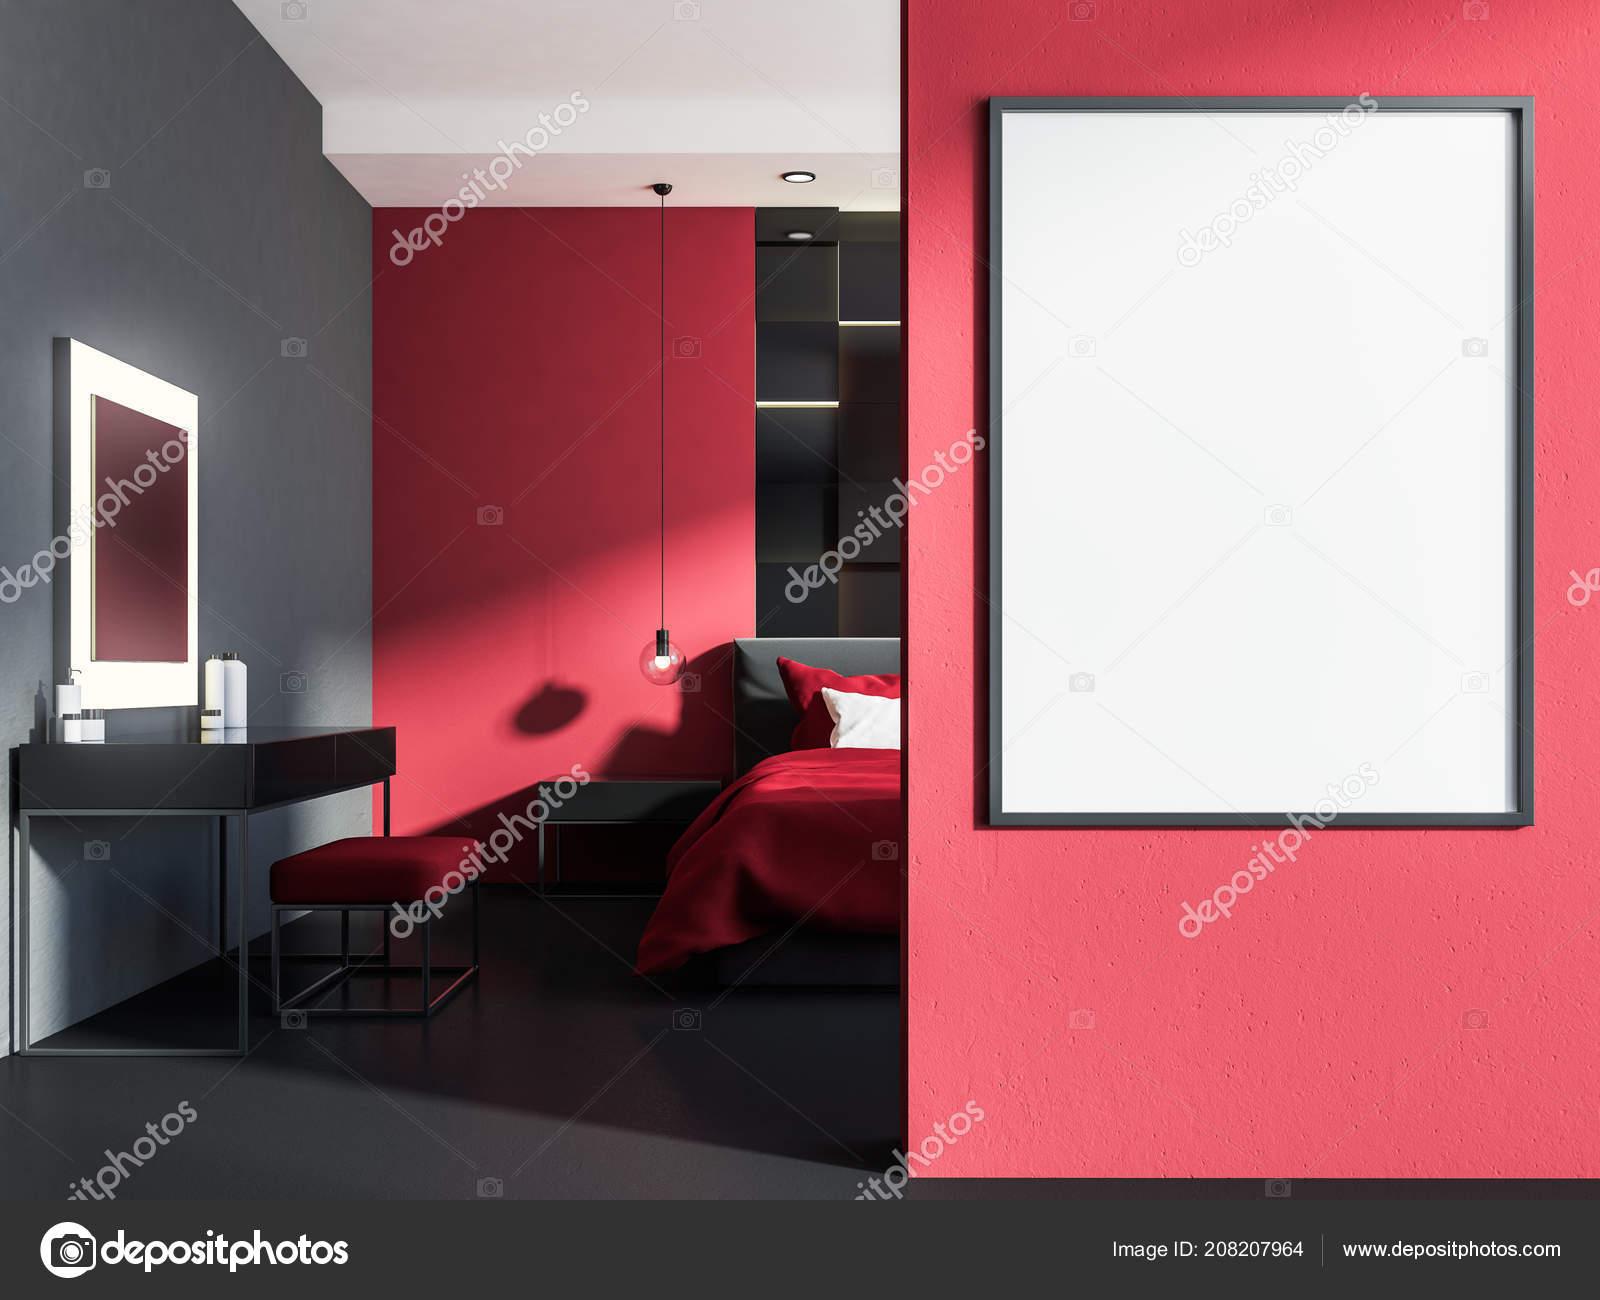 Pareti Grigie E Rosse : Interiore elegante camera letto con pareti rosse pavimento